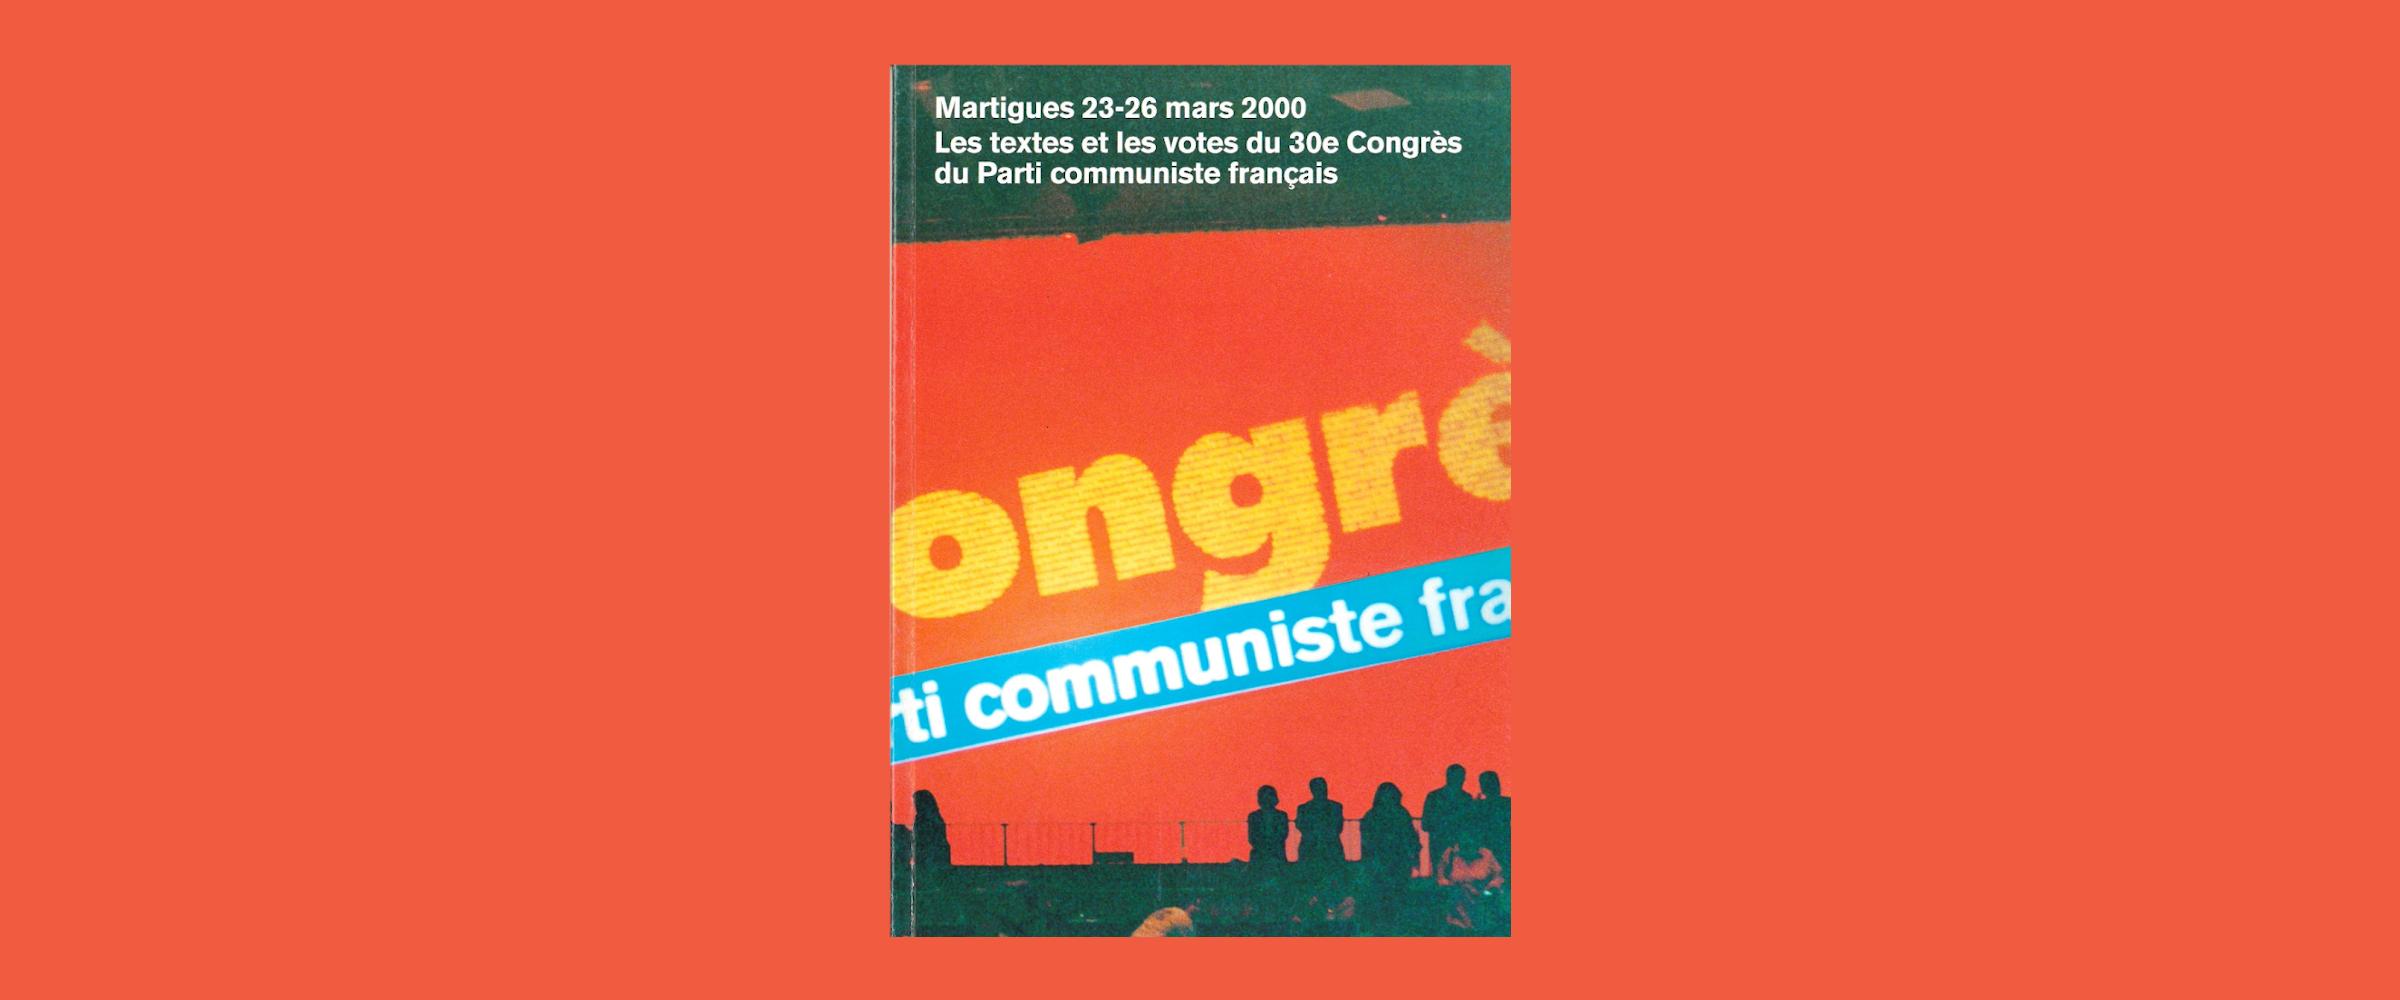 30ème Congrès, Martigues, mars 2000. Le grand malentendu